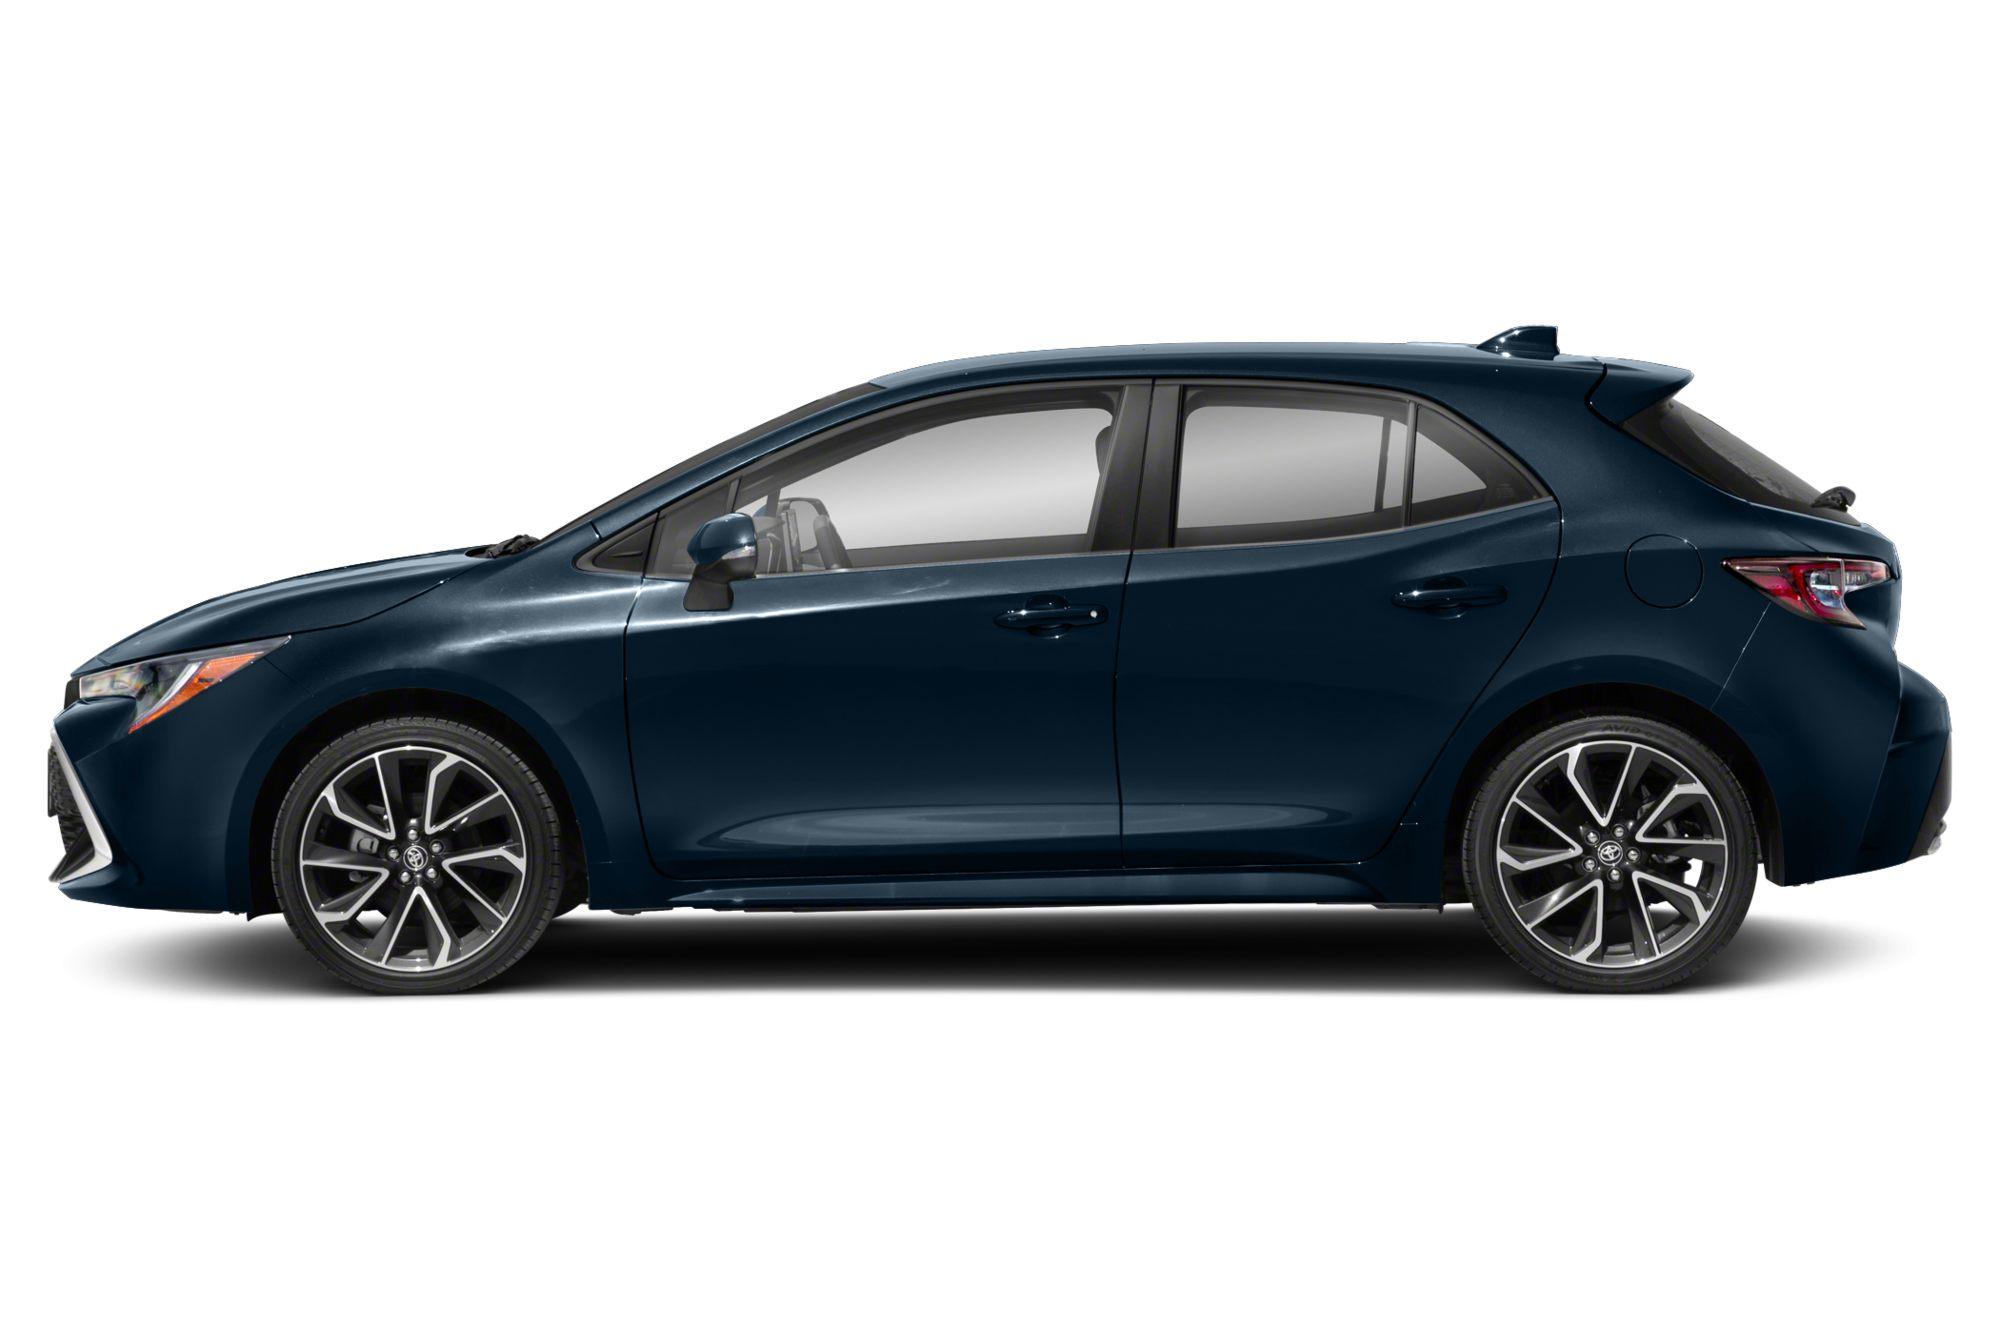 2020 Toyota Corolla Hatchback Redesign